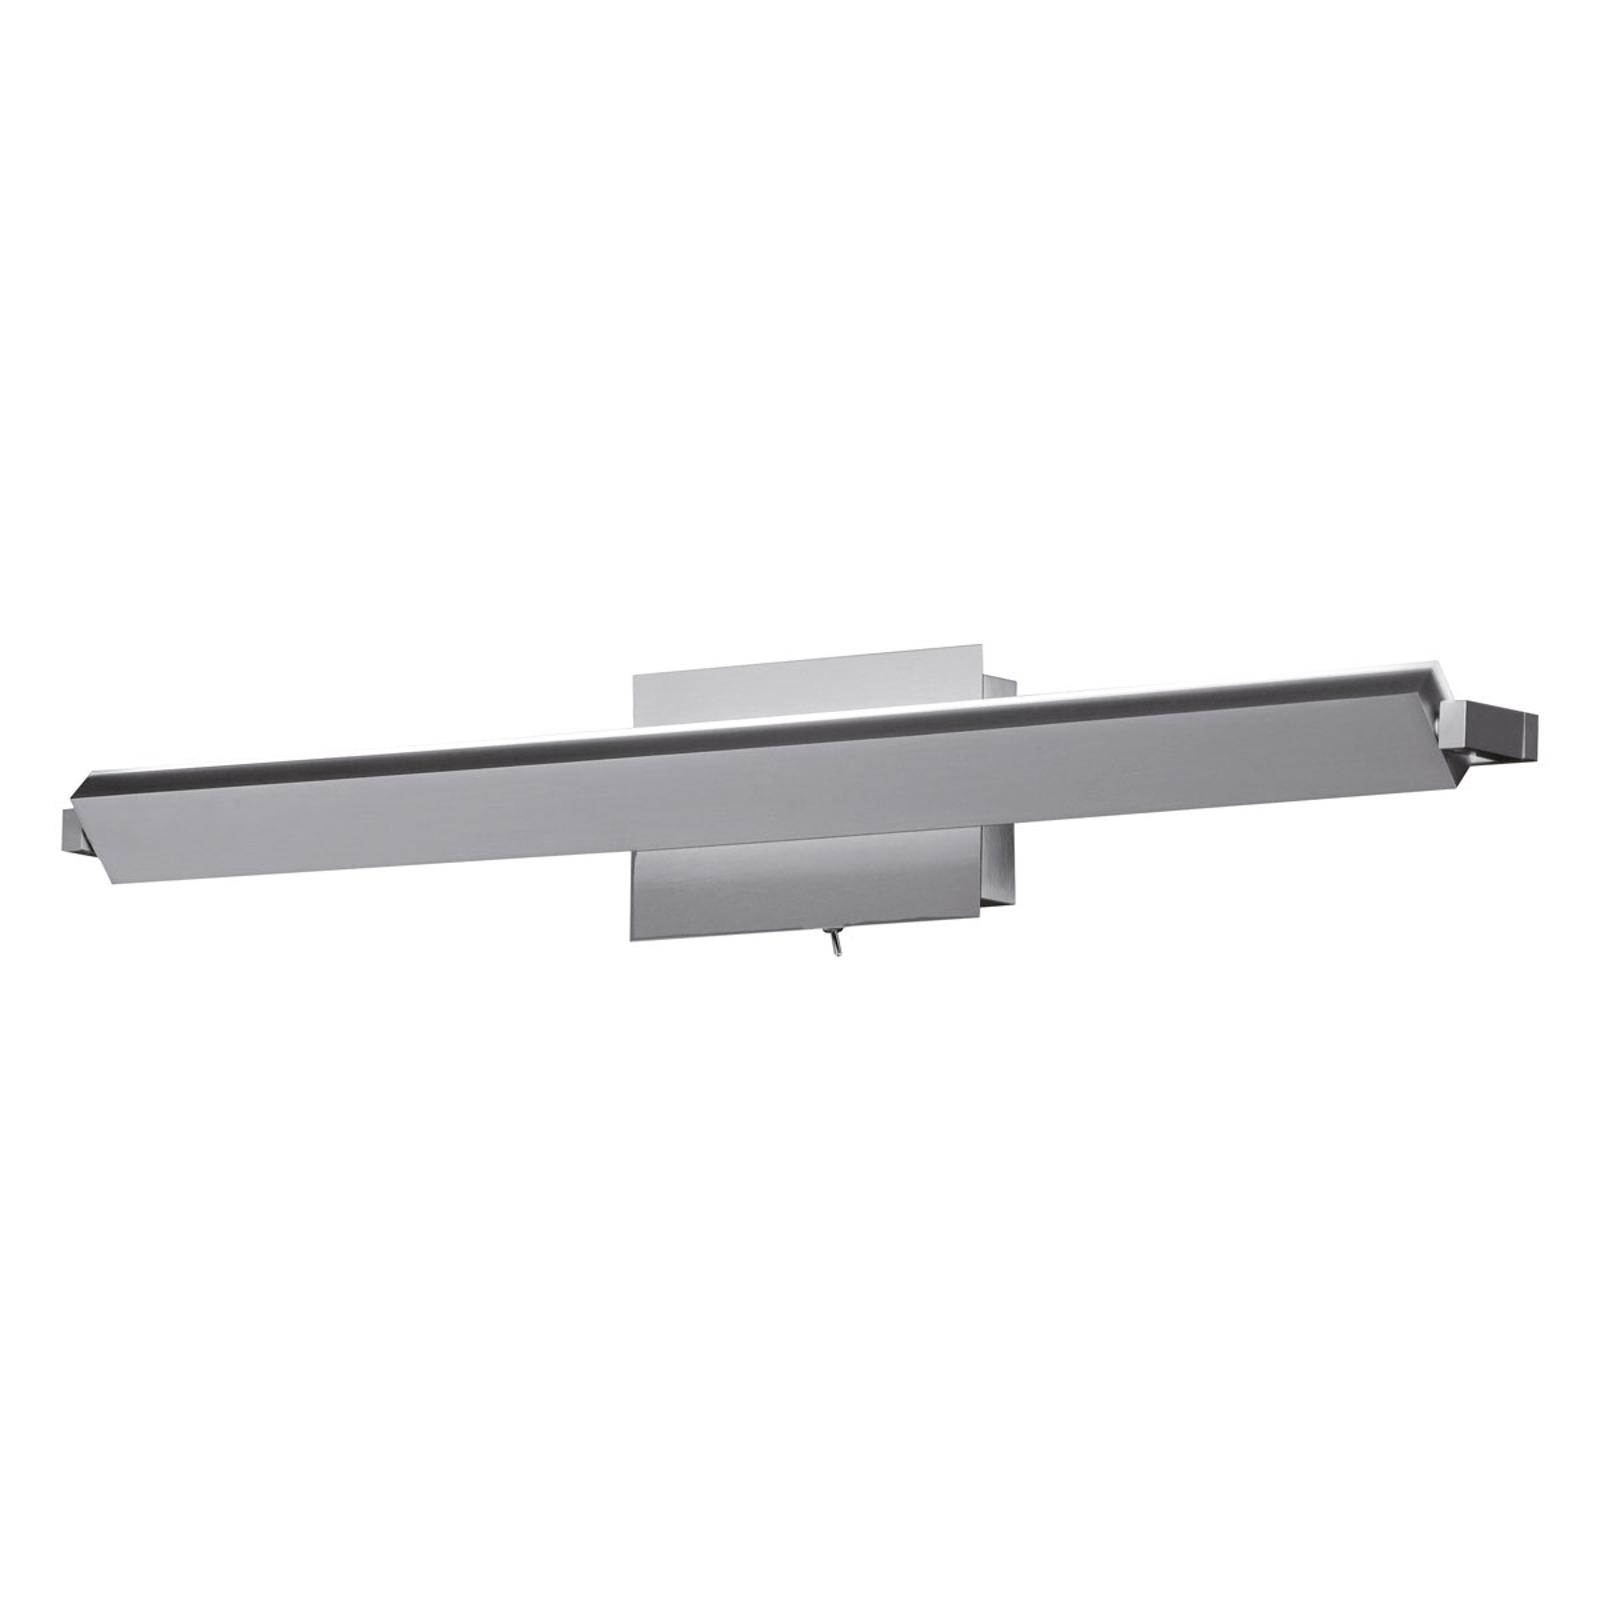 LED-vegglampe Pare, dreibar, med bryter, 58 cm